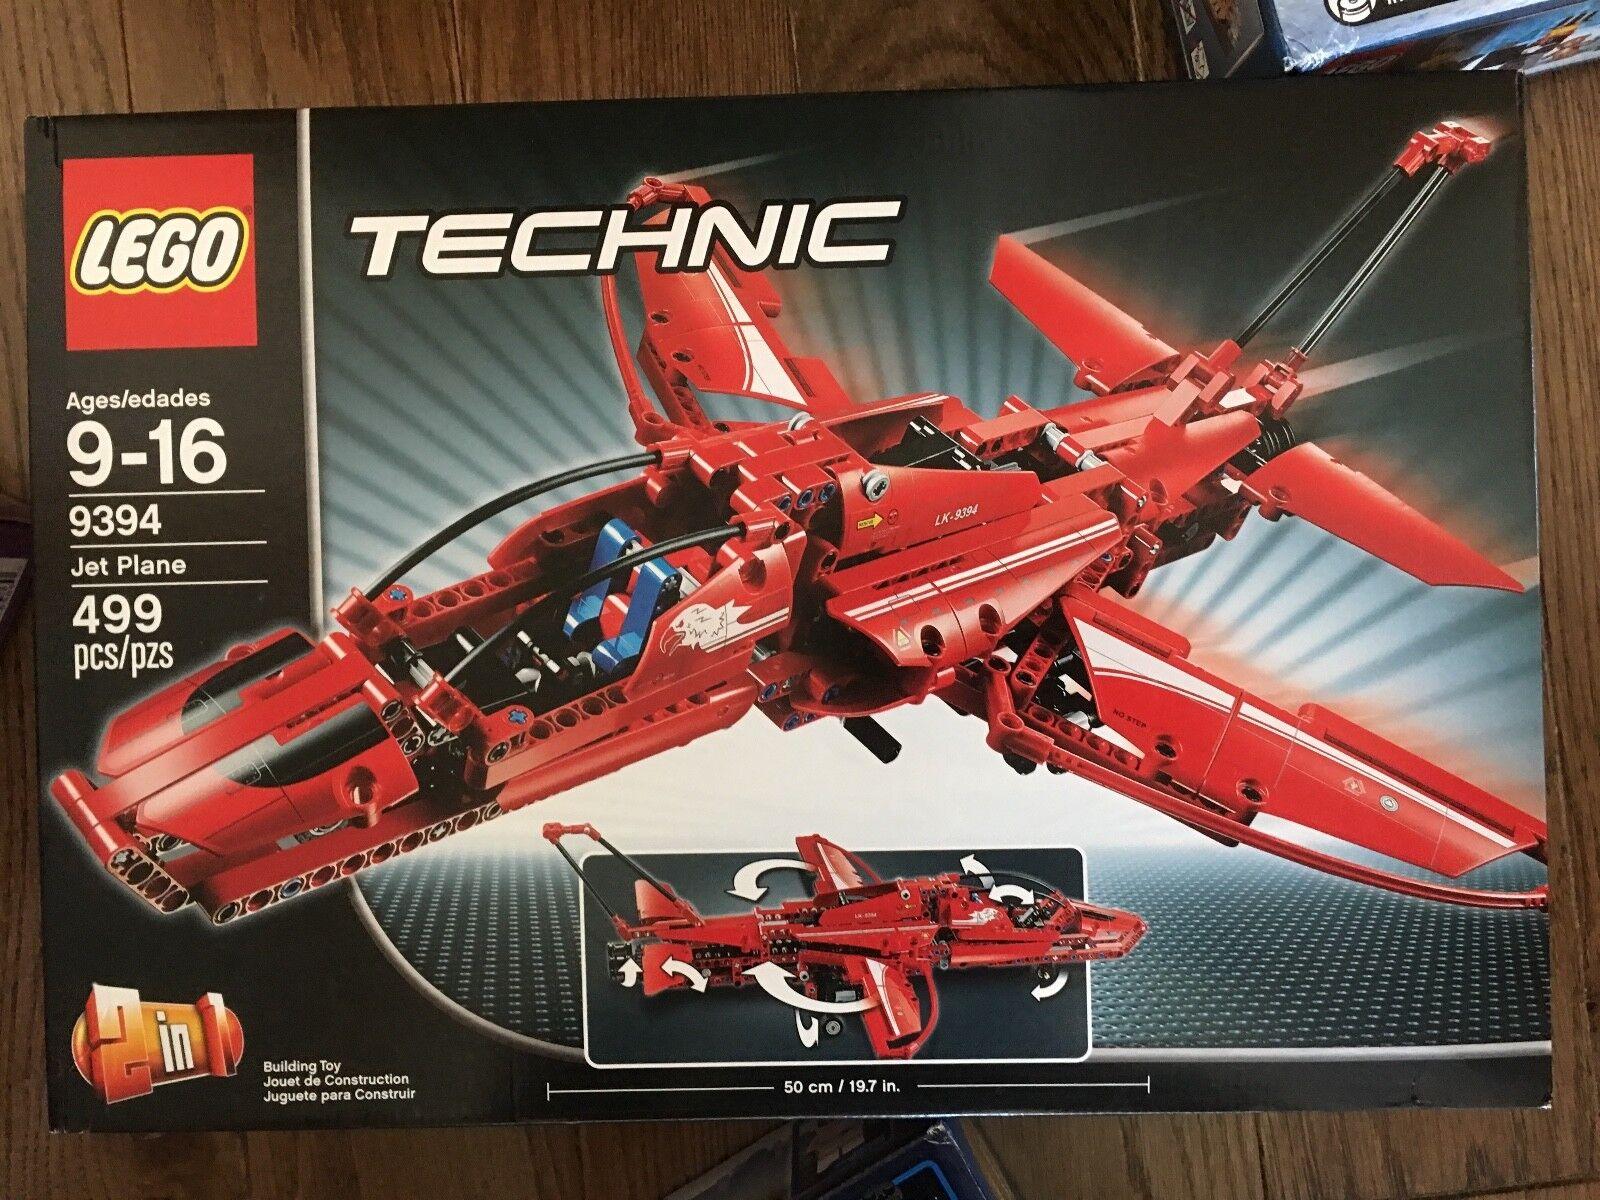 NEW & Sealed Lego (LEGO) Technique Jet Plane 9394 9394 9394 Age 9 - 16 485d56